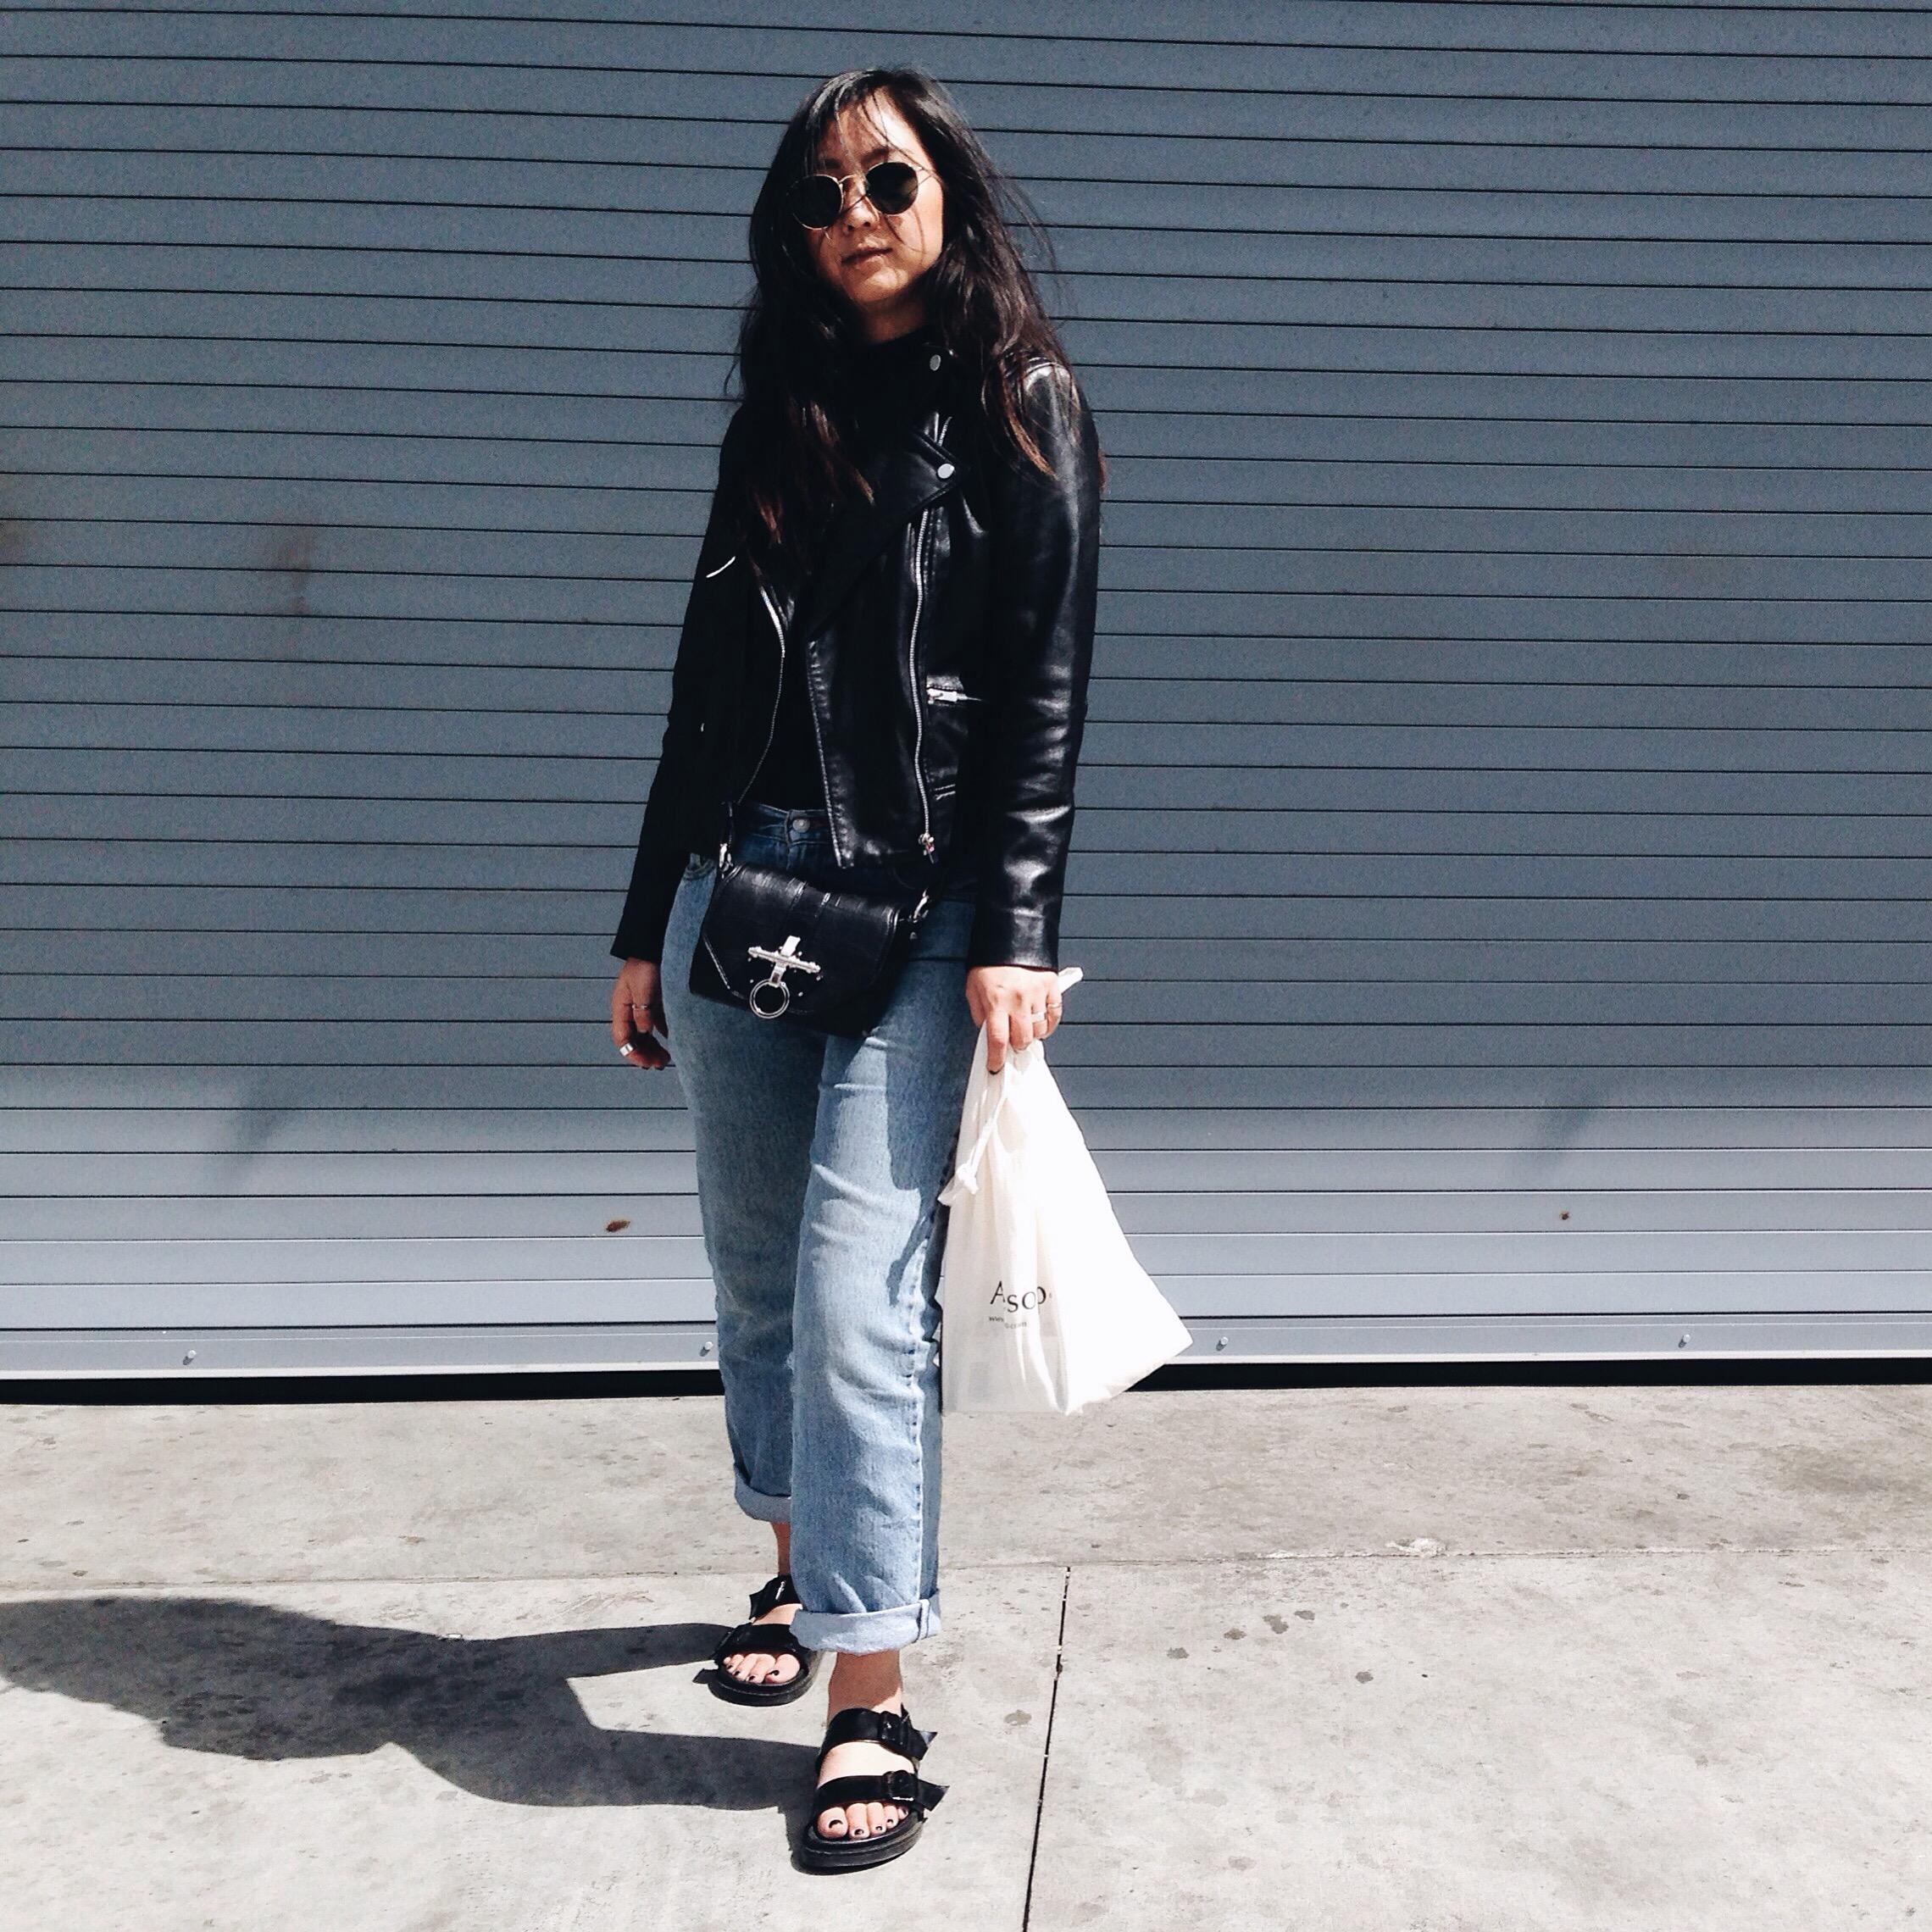 FREE PEOPLE   mock turtleneck    / MANGO  leather jacket  /LEVI'S  jeans  / ZARA  sandals / GIVENCHY  Obsediabag